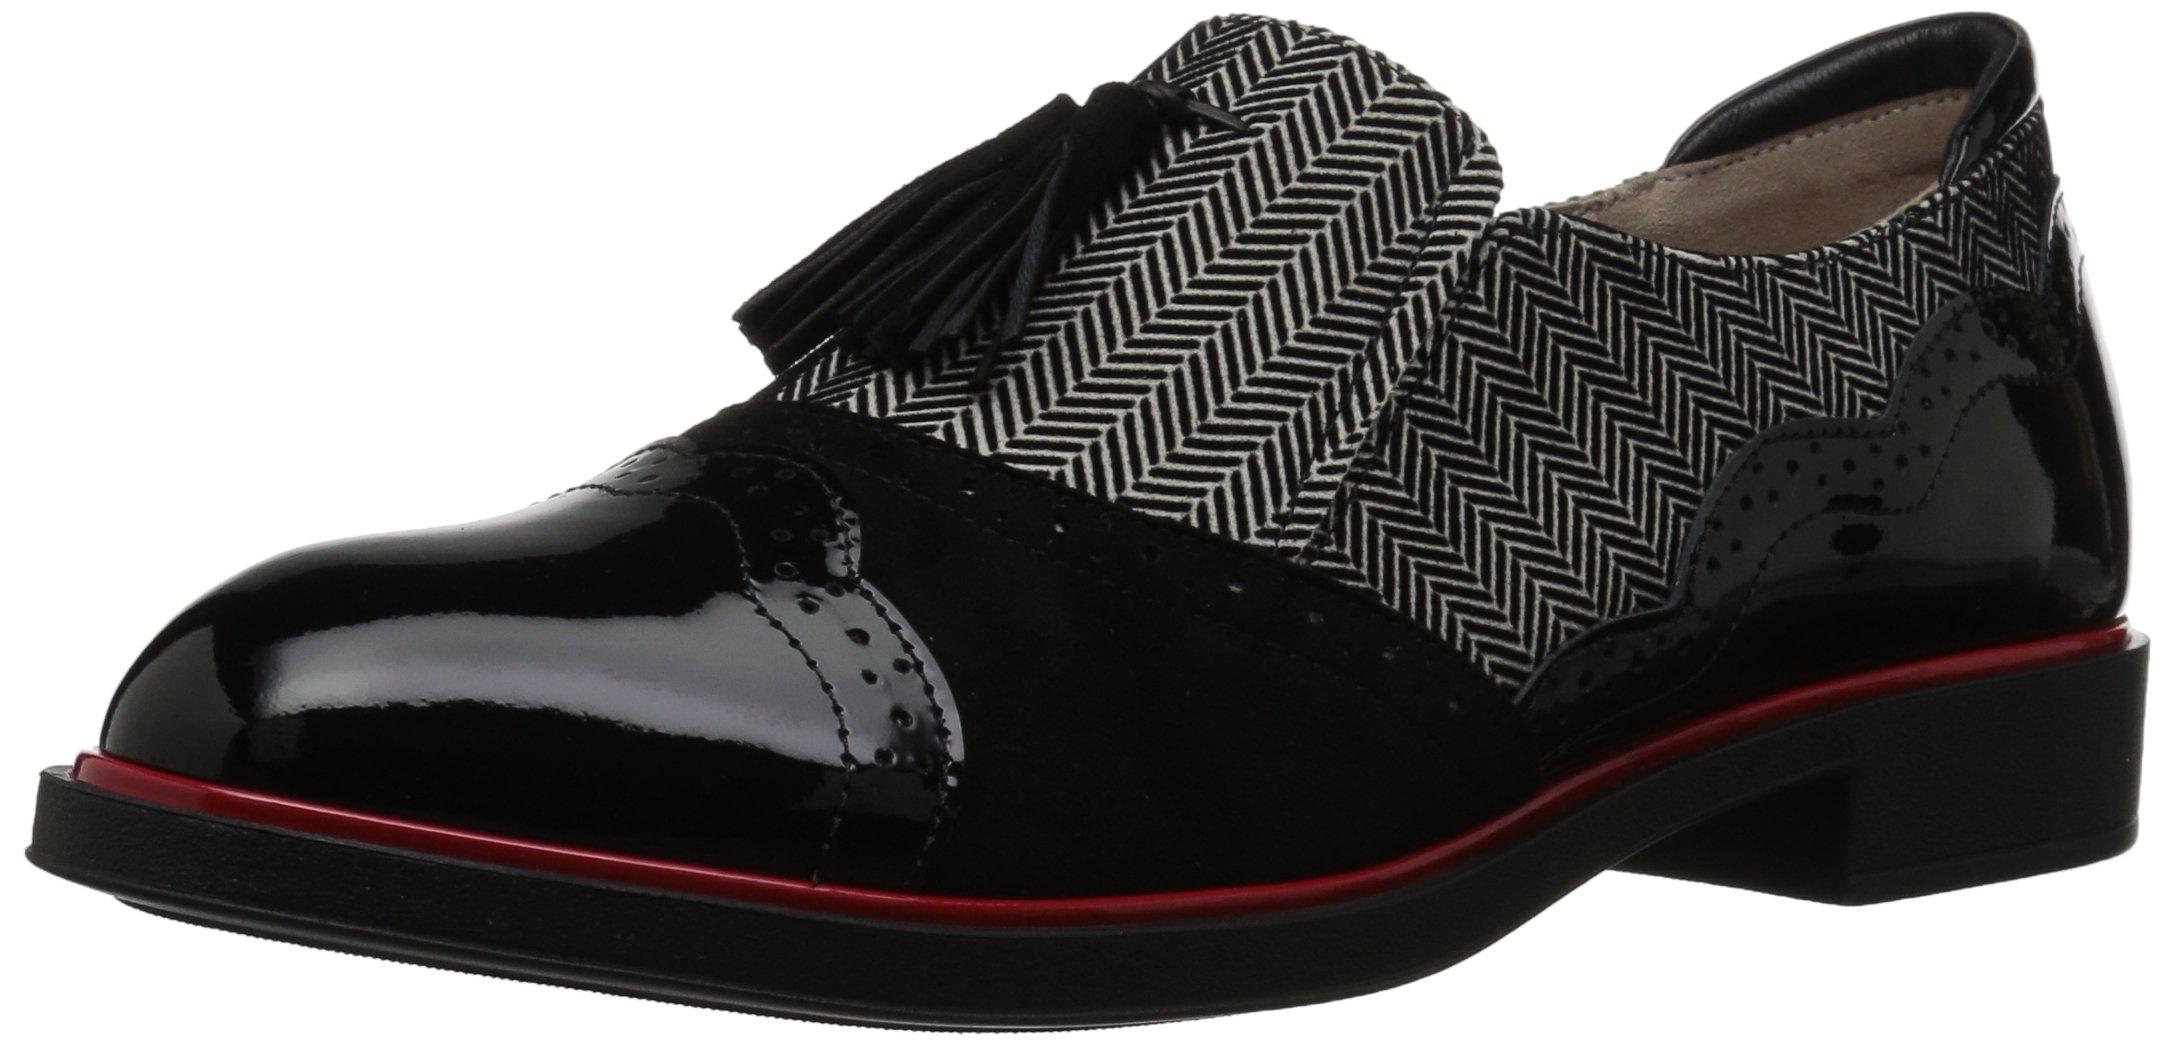 BeautiFeel Women's Ria Loafer, Ivory/Black 3D Spigato Combination, 39 Medium EU (8 US)